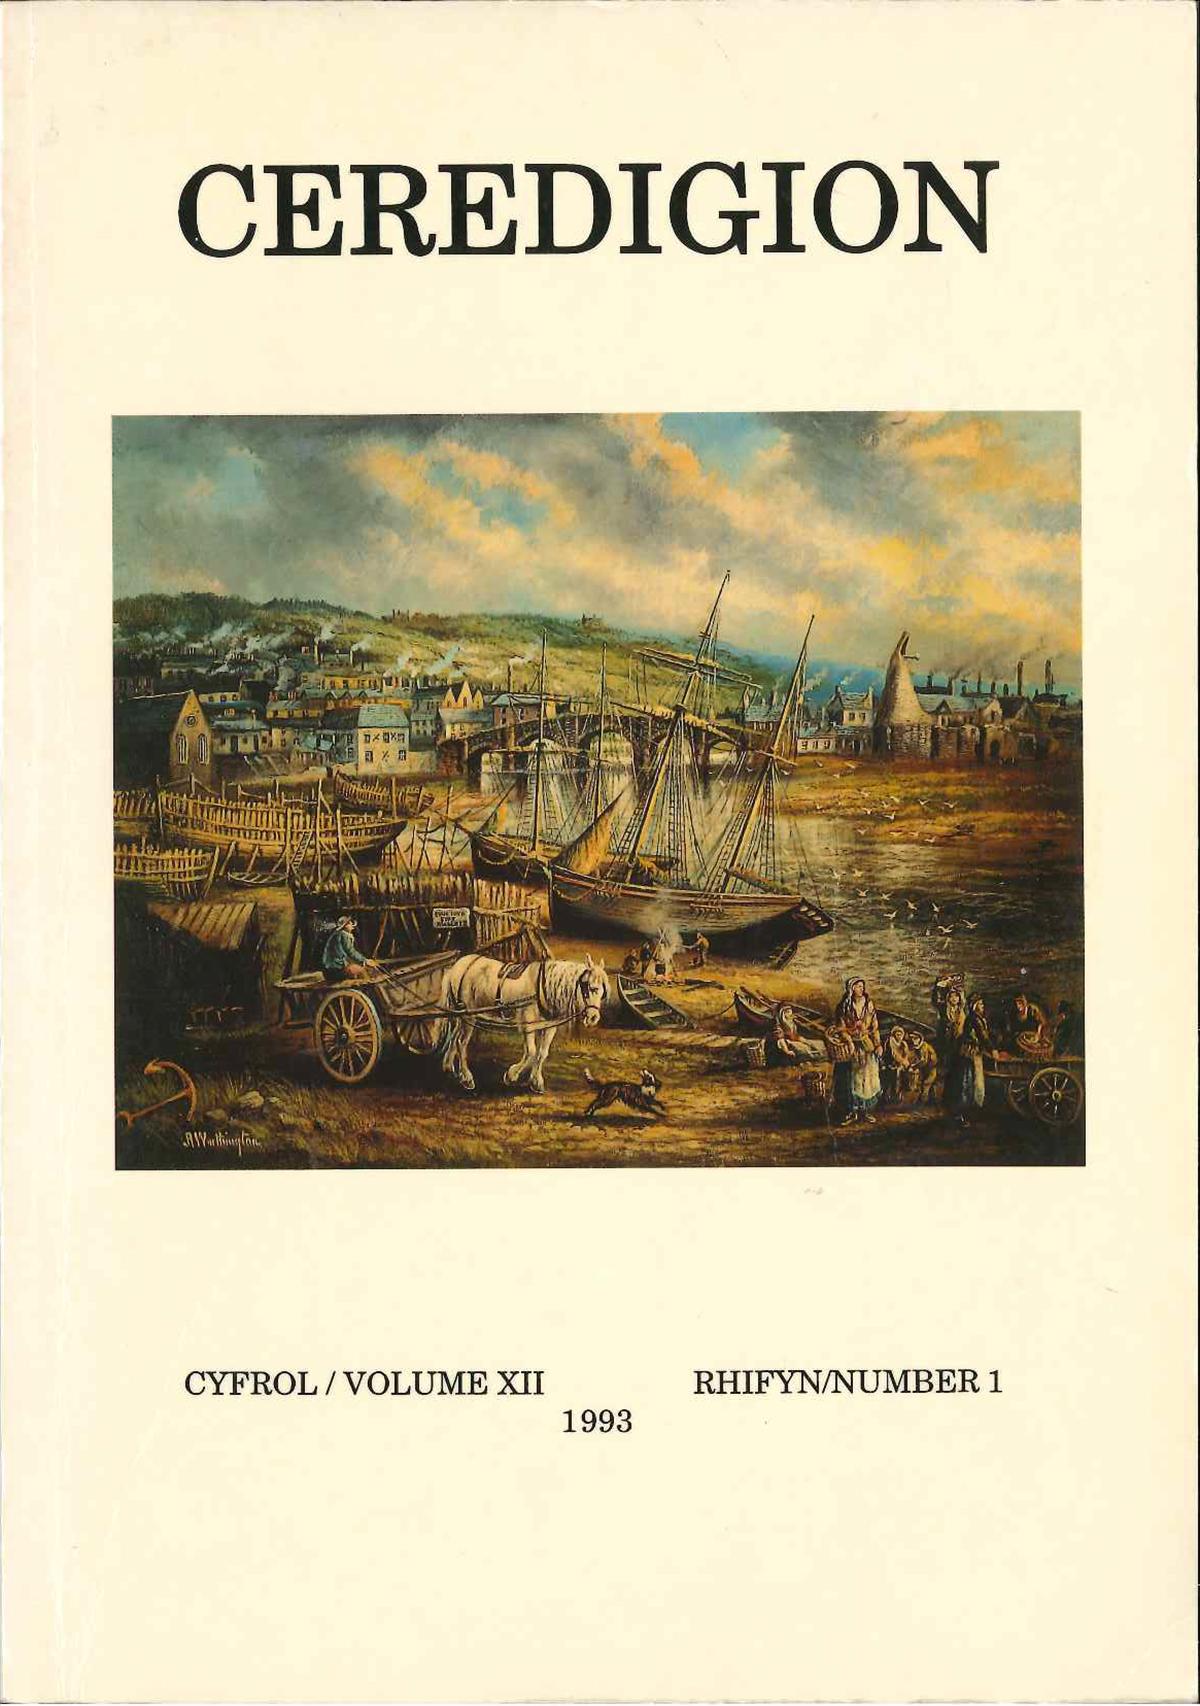 Ceredigion Journal of the Ceredigion Antiquarian Society Vol XII, No I 1993 - ISBN 0069 2263